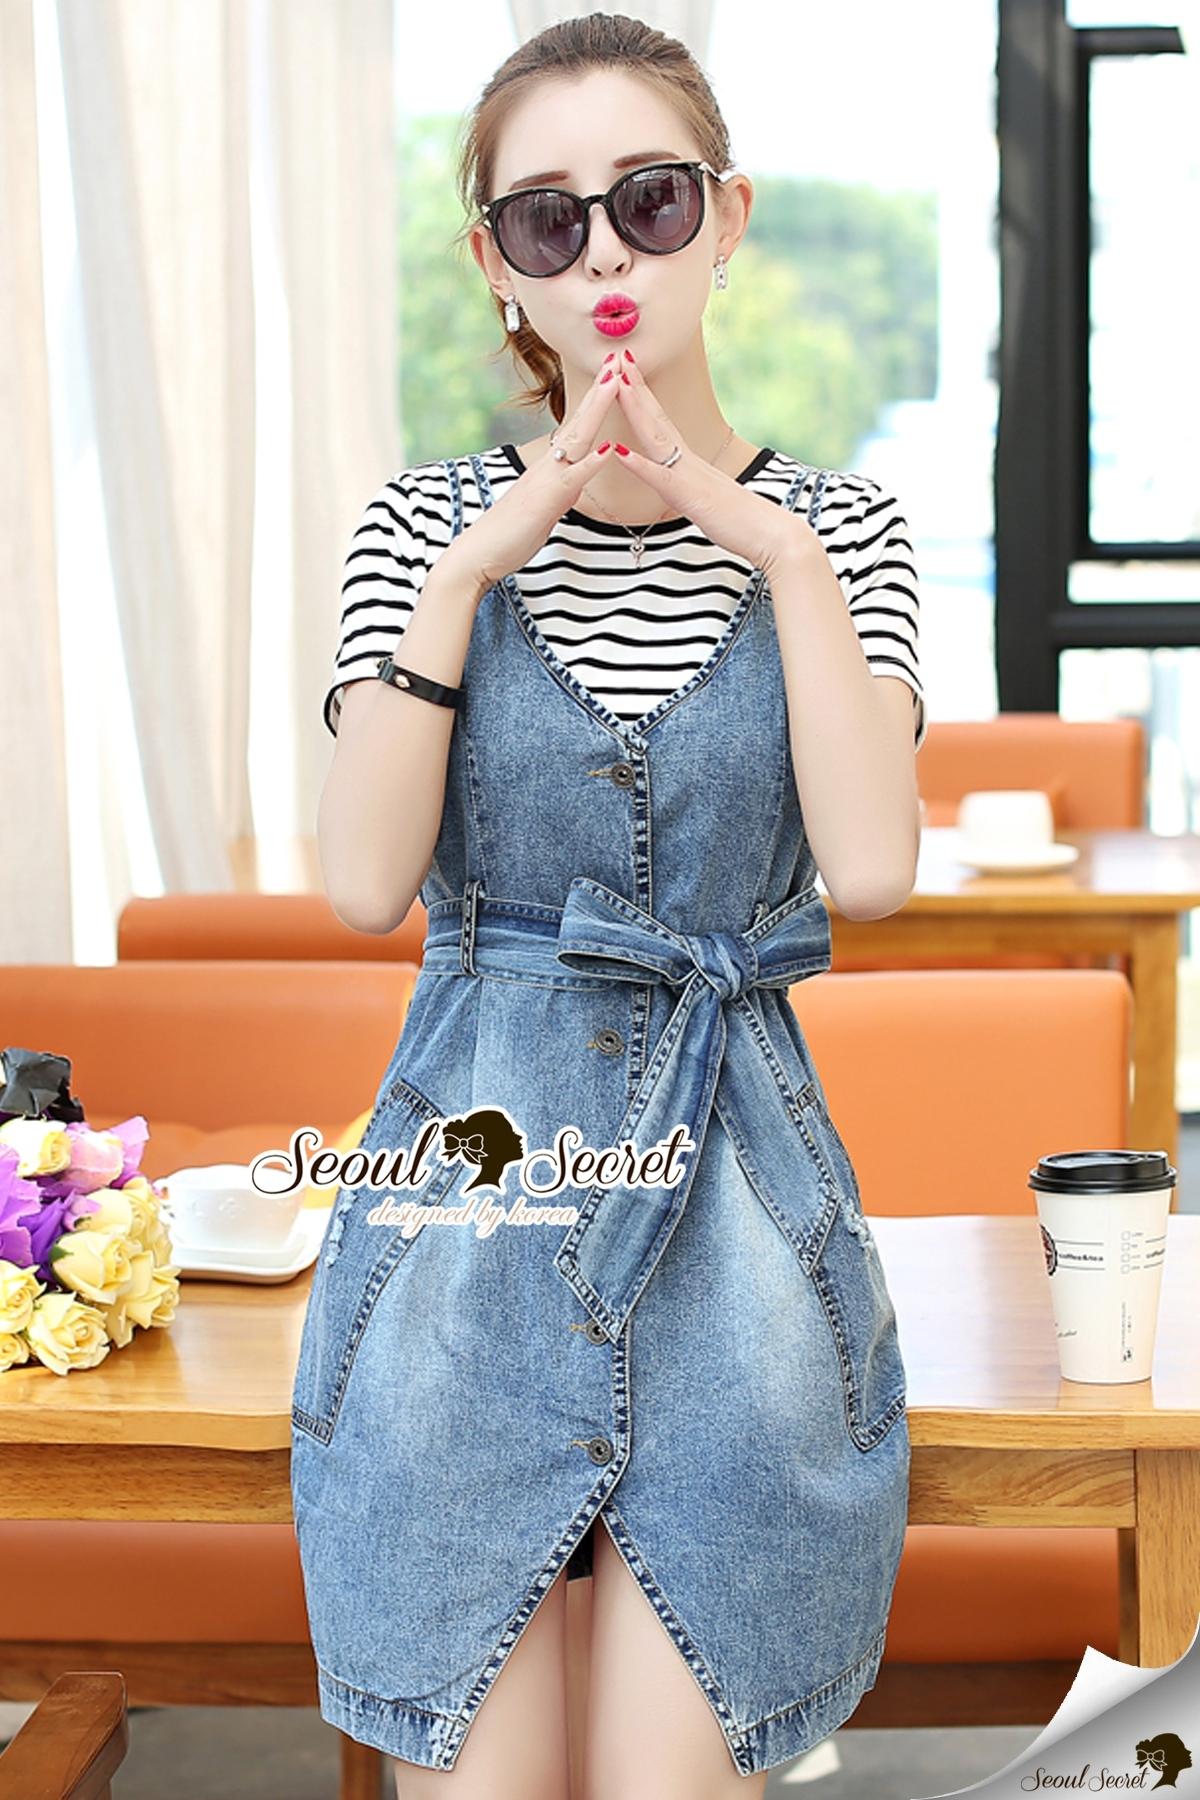 Seoul Secret Say's... Chill Cami Denim Dress Stripy Cami Blouse Set